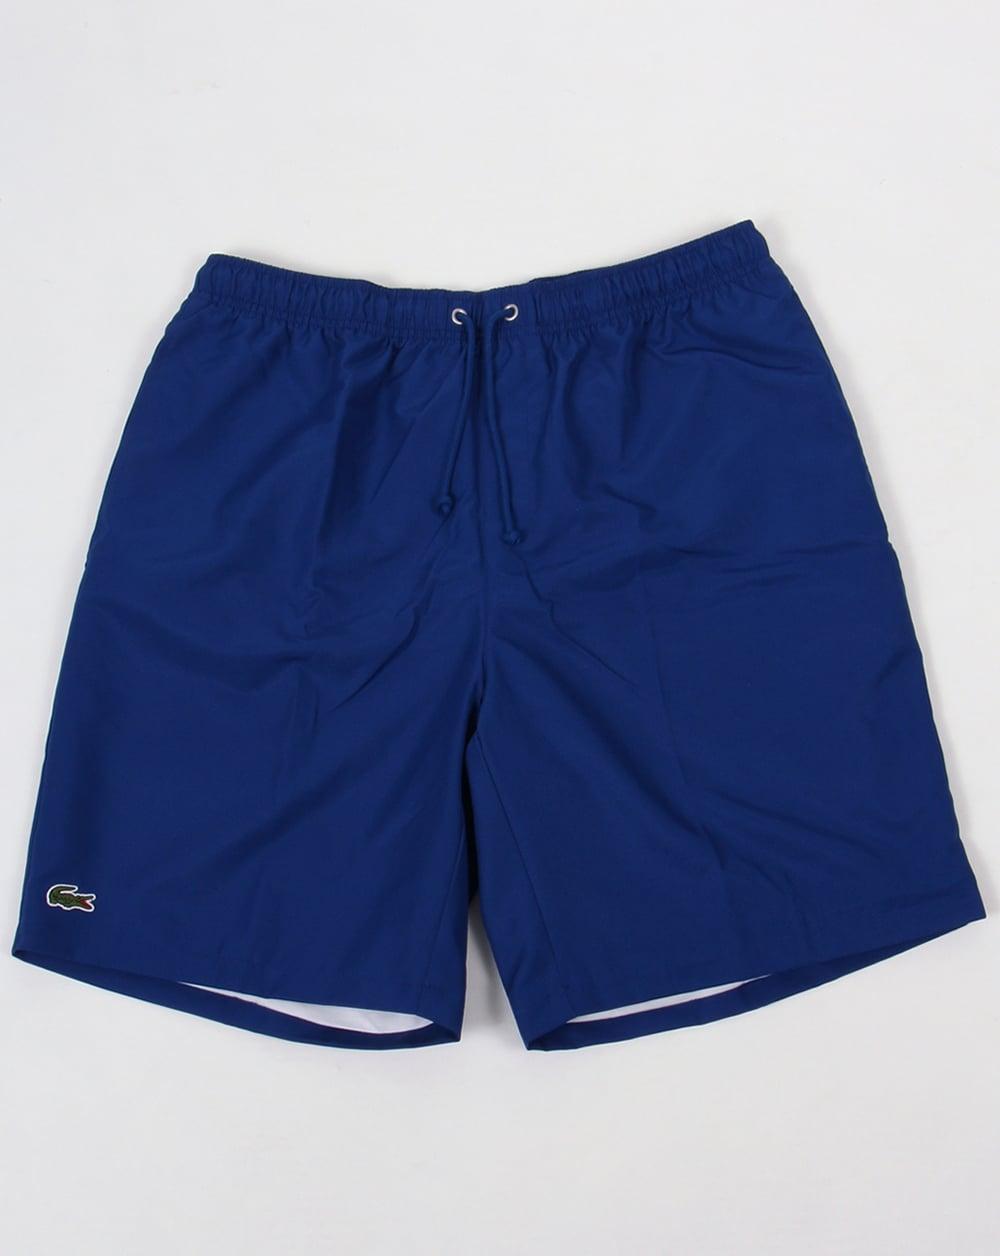 lacoste sport diamond drawstring shorts royal blue tennis